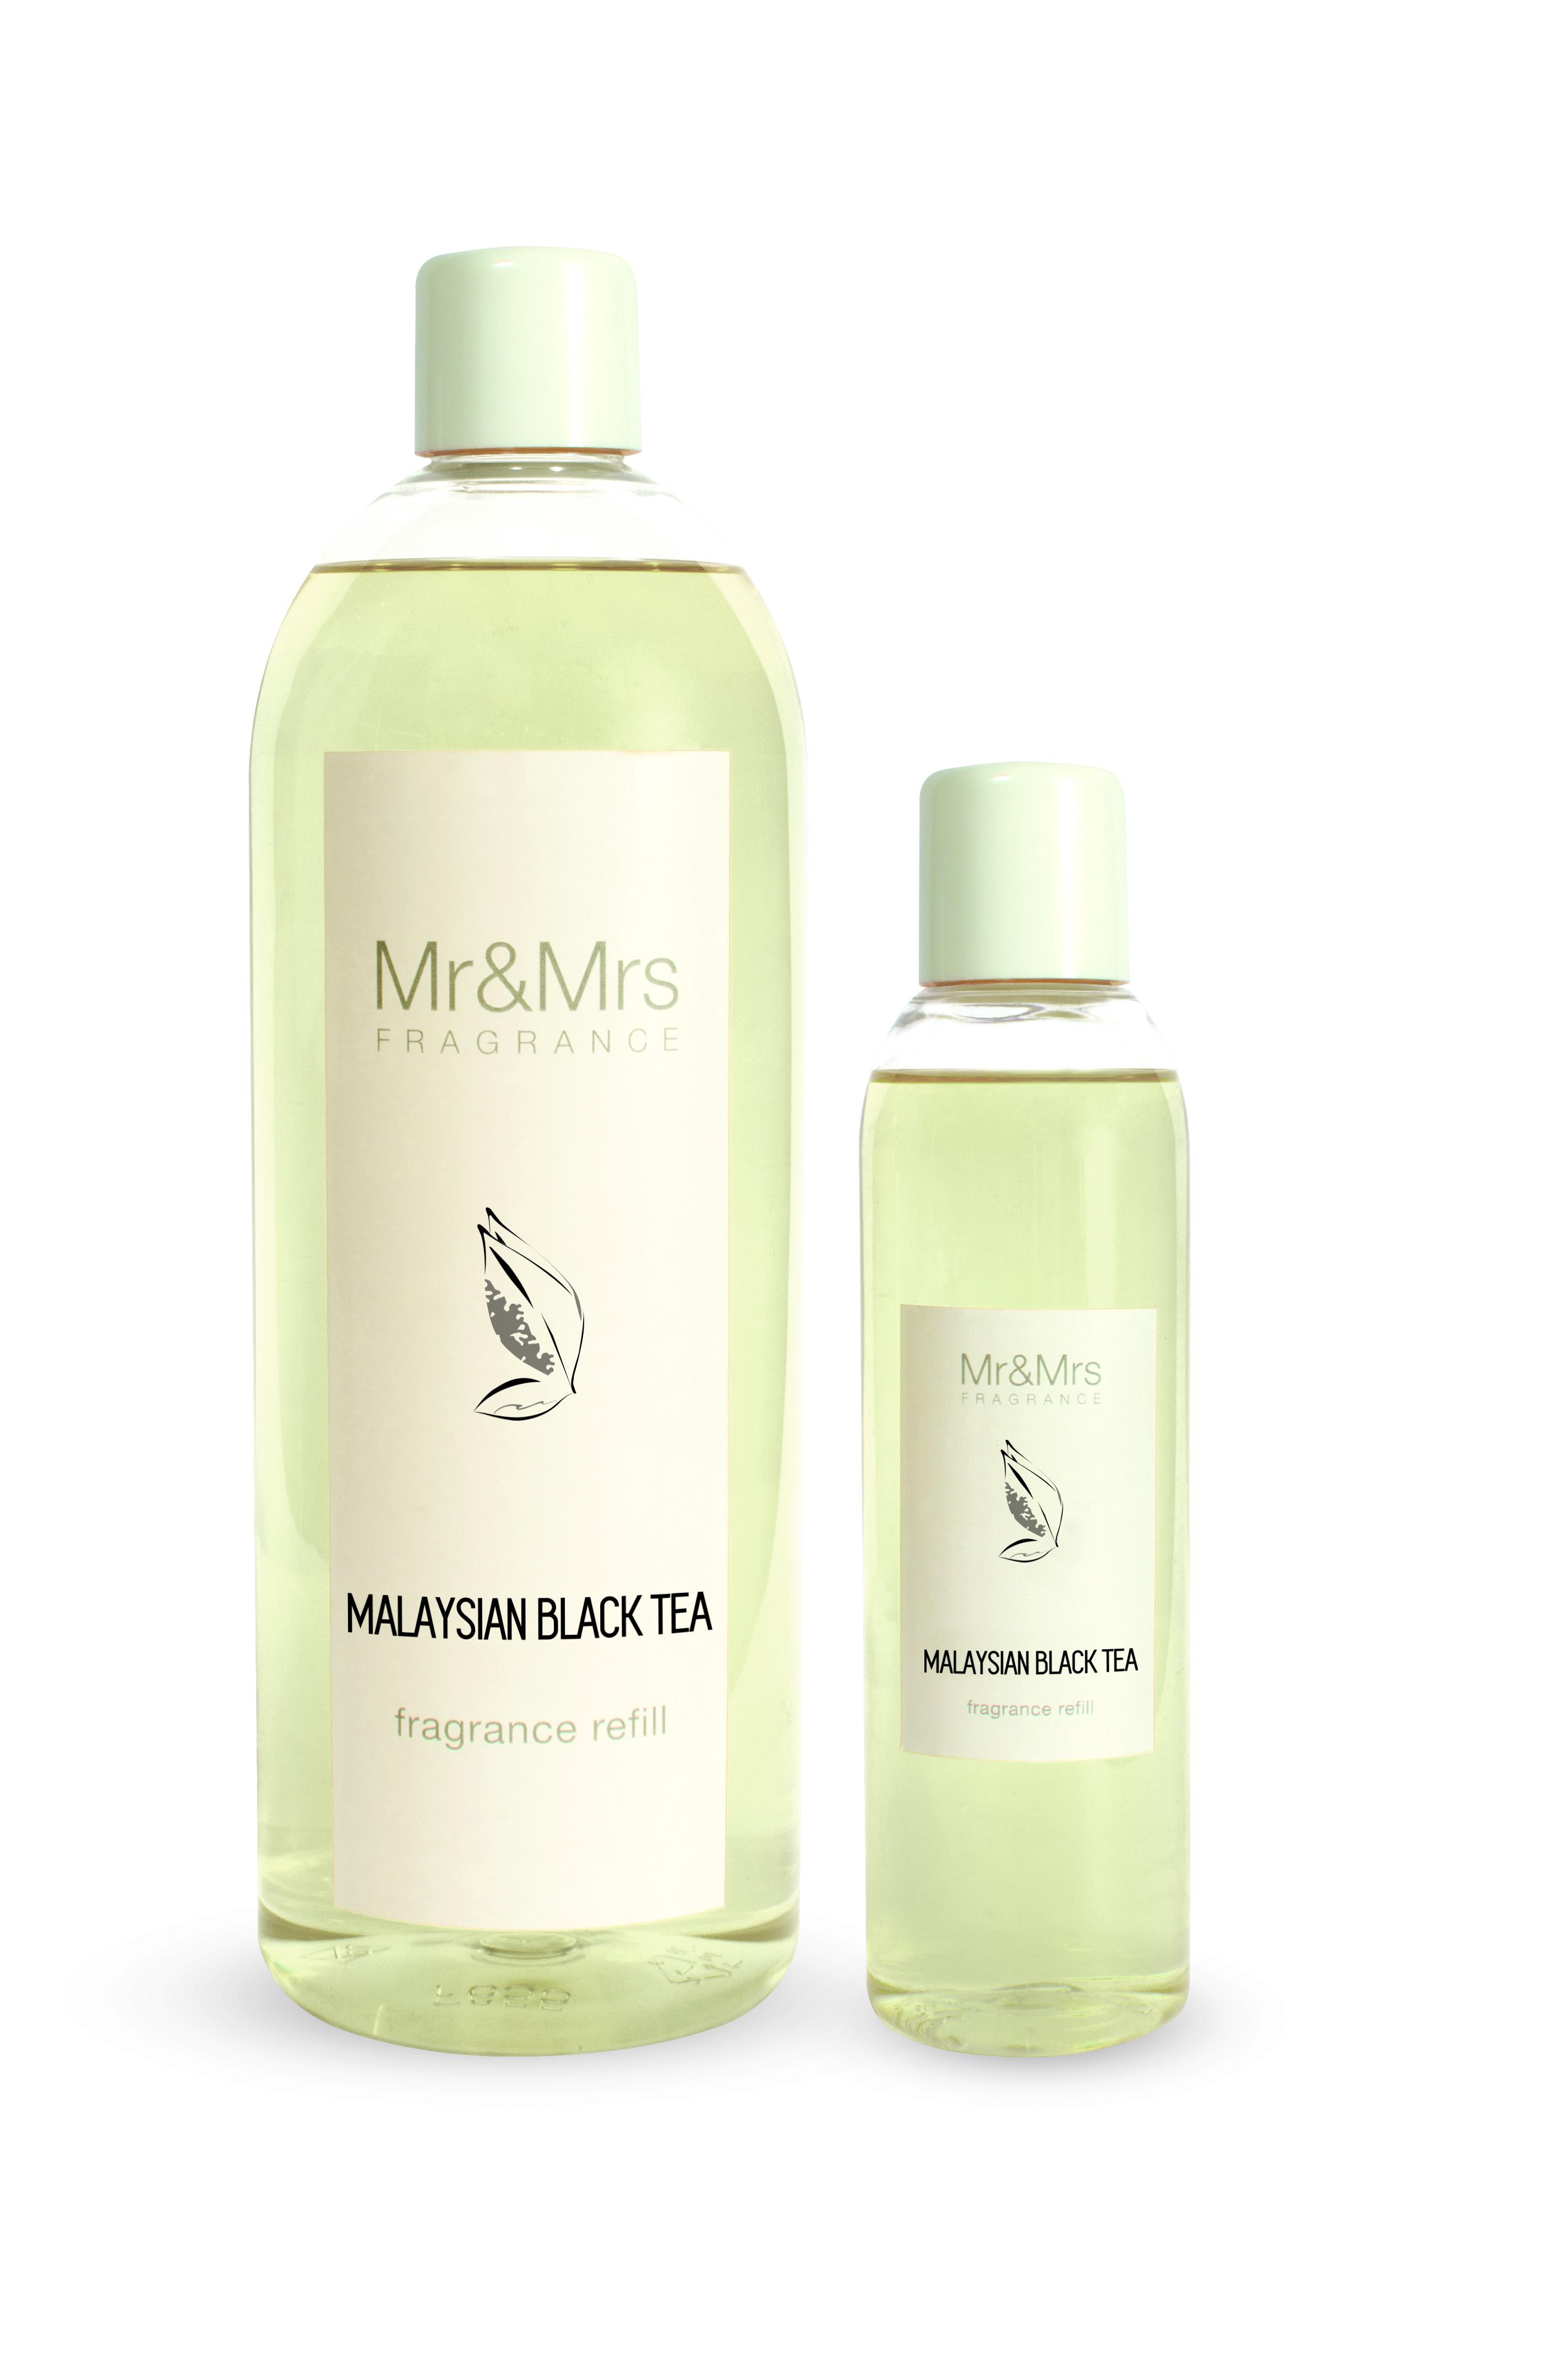 Mr&Mrs Fragrance MR&MRS FRAGRANCE NÁPLŇ DO DIFUZÉRU - MALAYSIAN BLACK TEA - 200 ML 200 ml